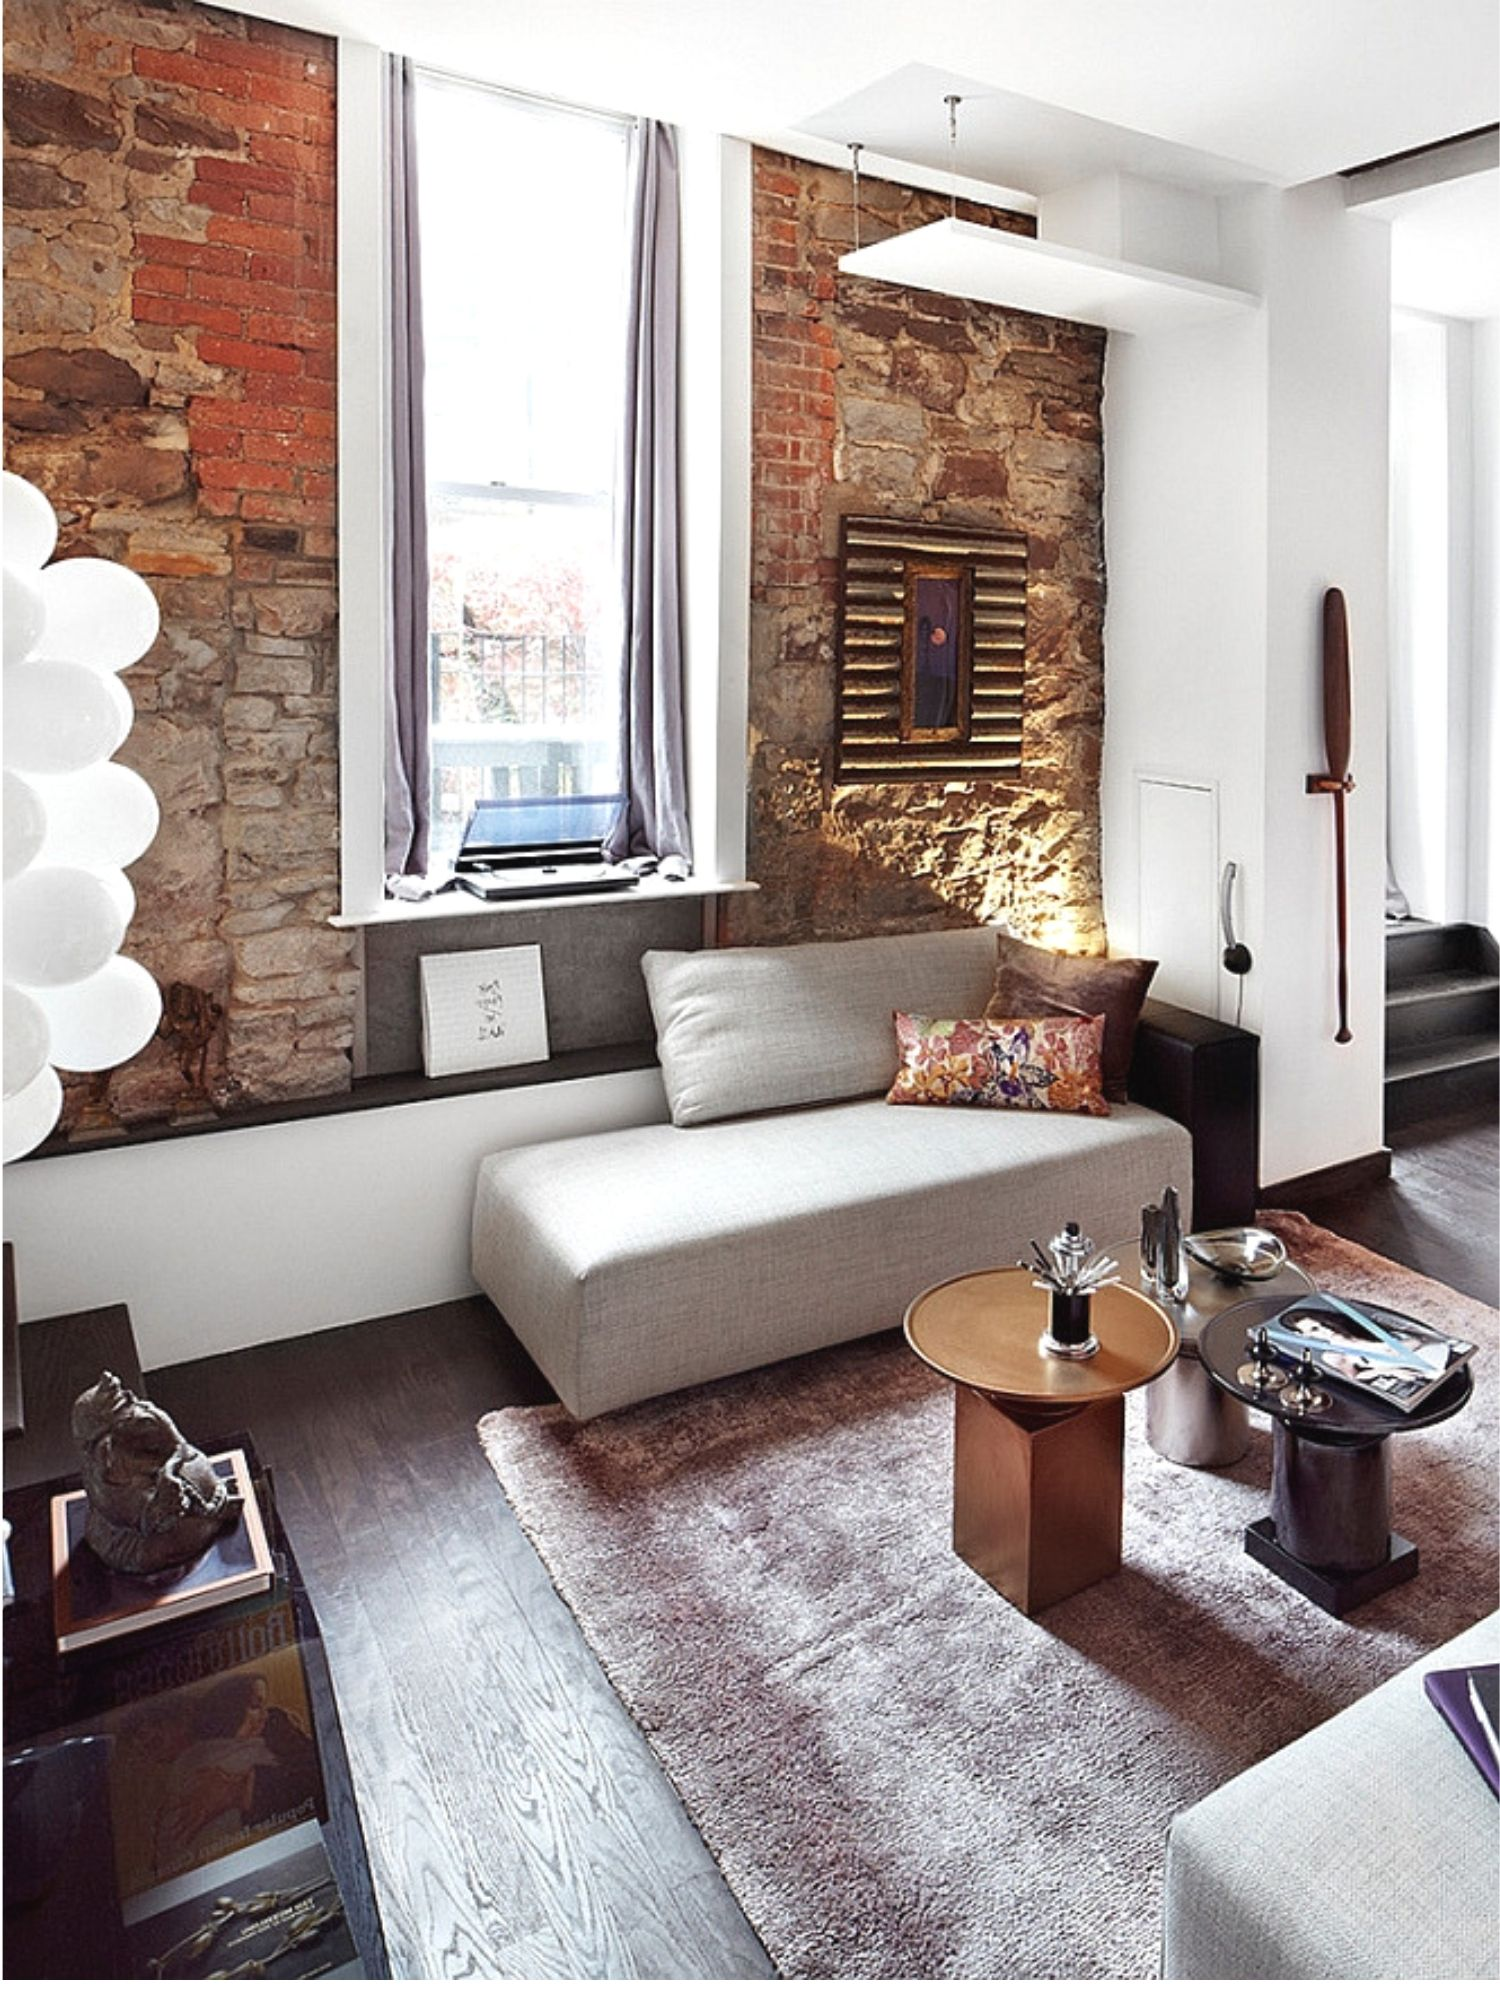 Urban Modern Interior Design House 109 Urbanmoderninteriordesign Design Interiordesign Inte Small House Interior Interior Design Best Home Interior Design